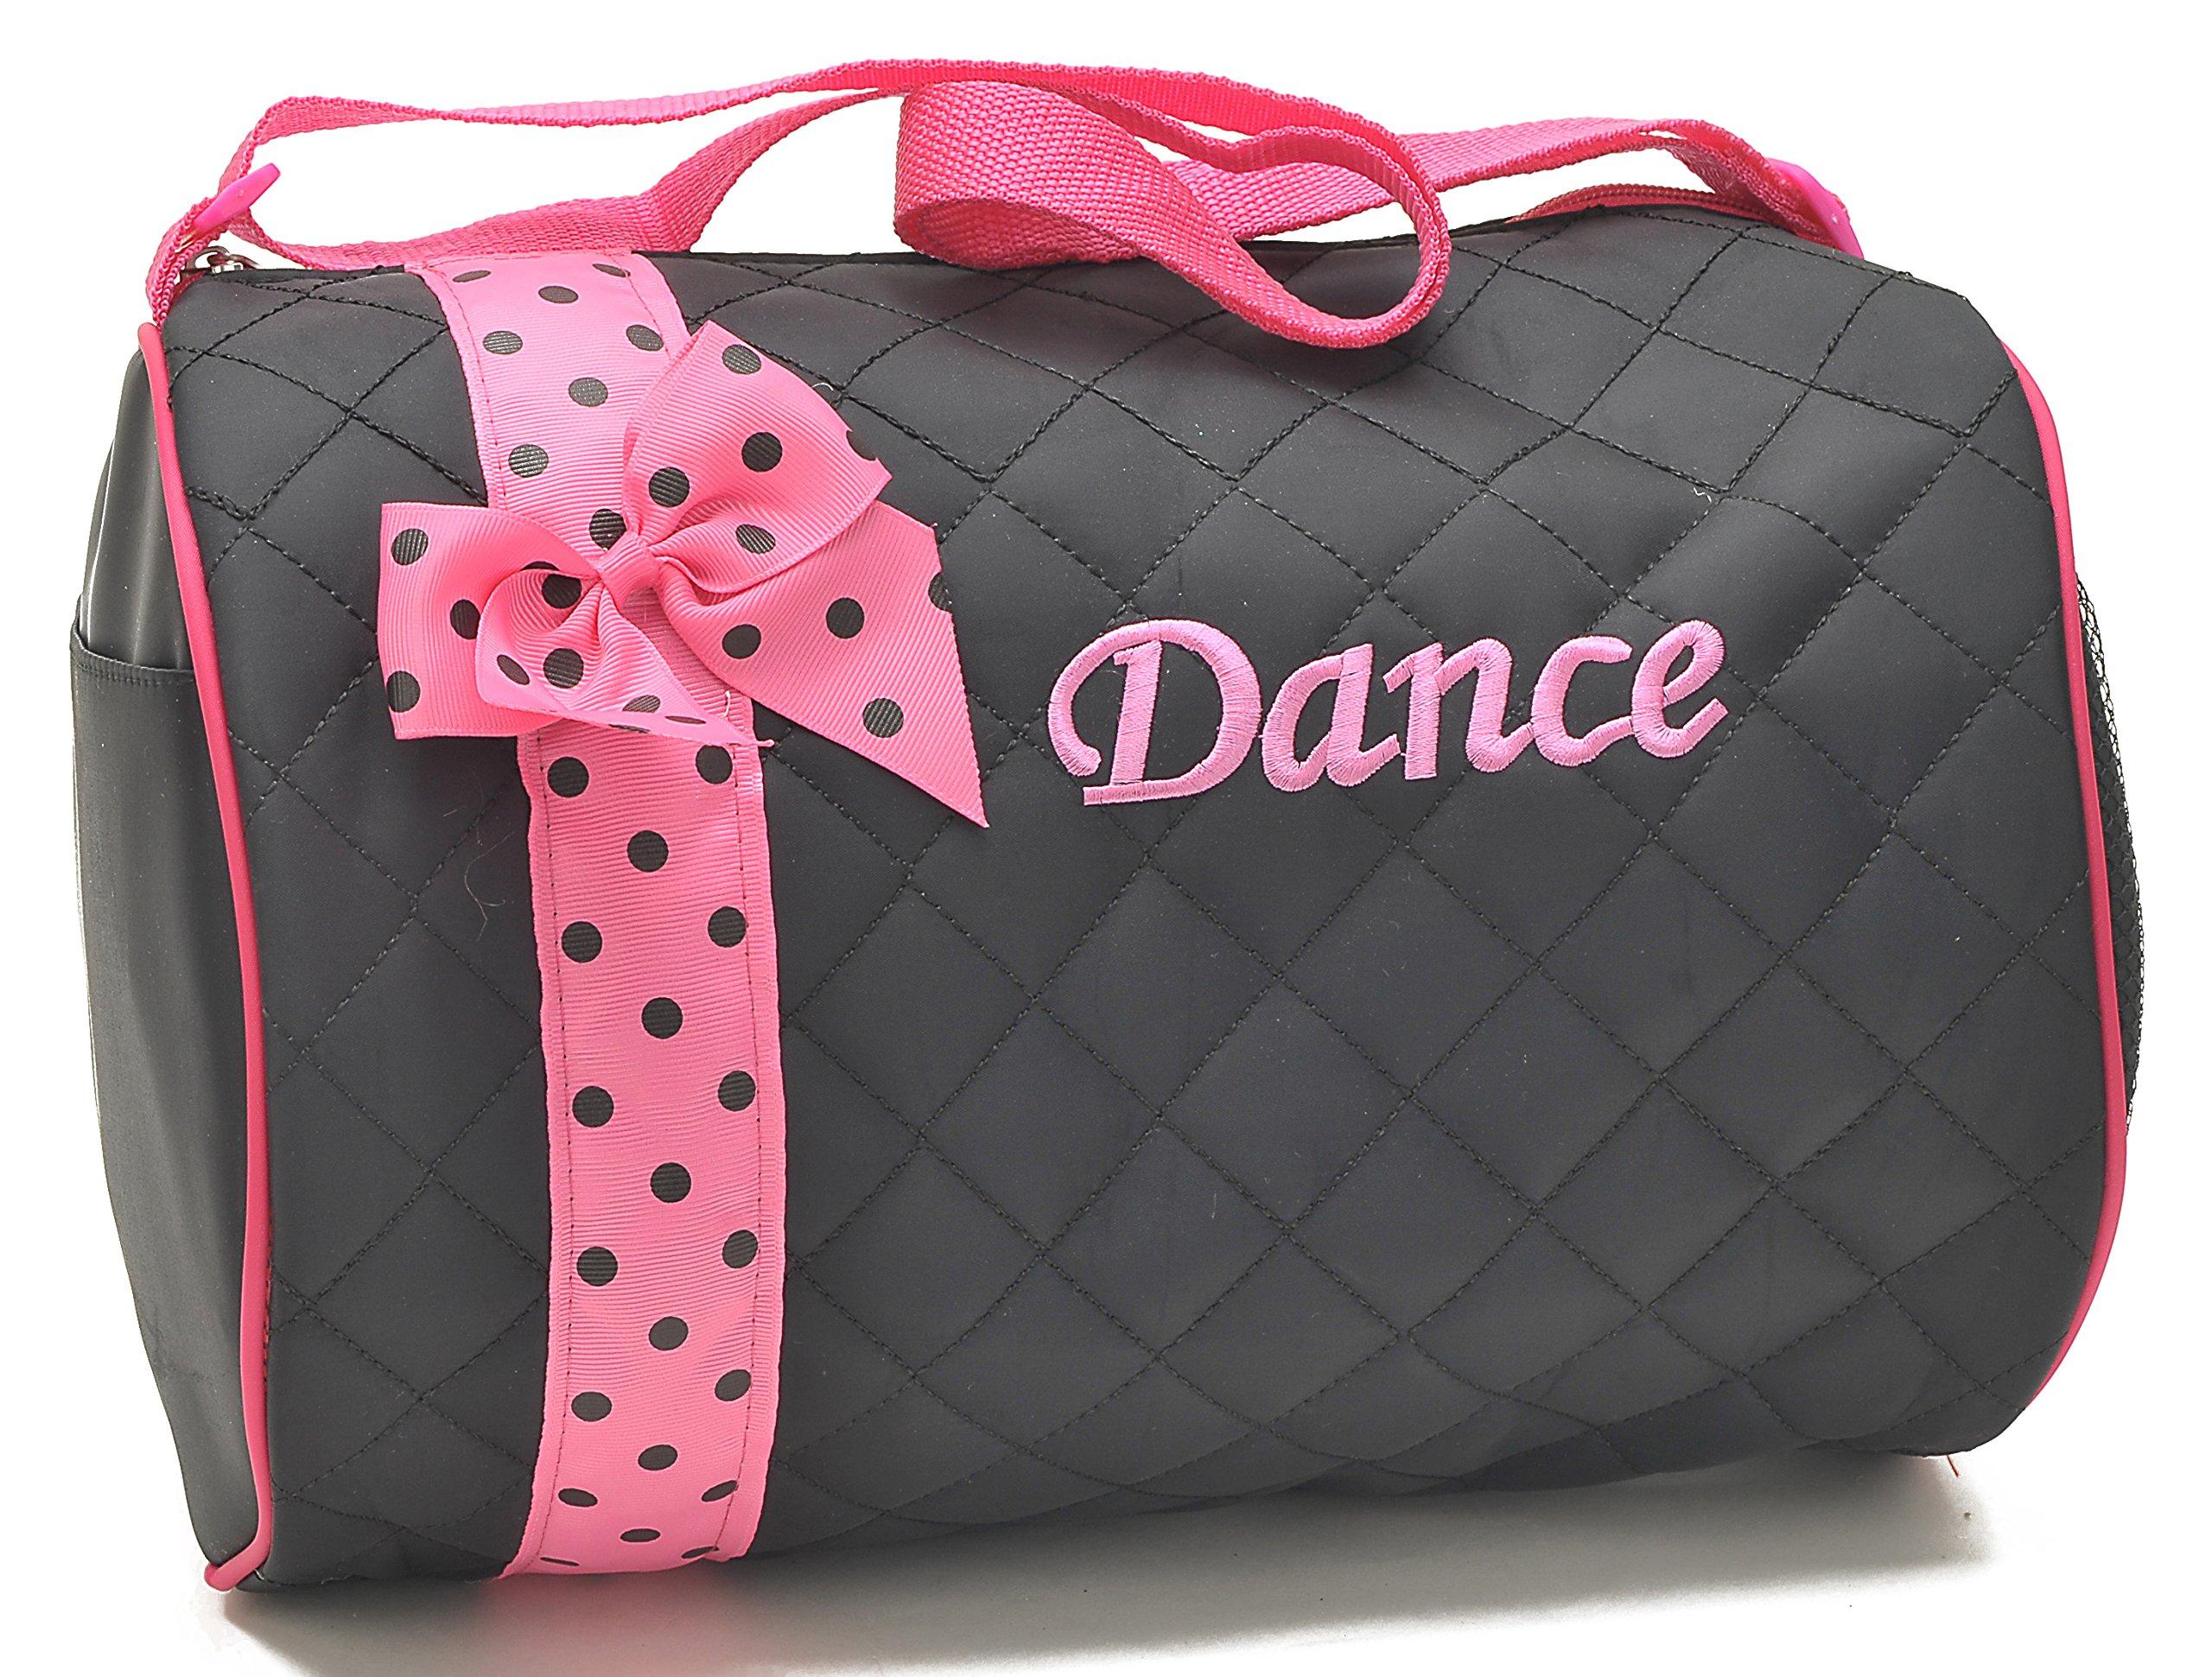 1 Perfect Choice Girl's Dance Duffle Bag, Kids Totes Bag, Quilted Ribbon Polka Dots Black